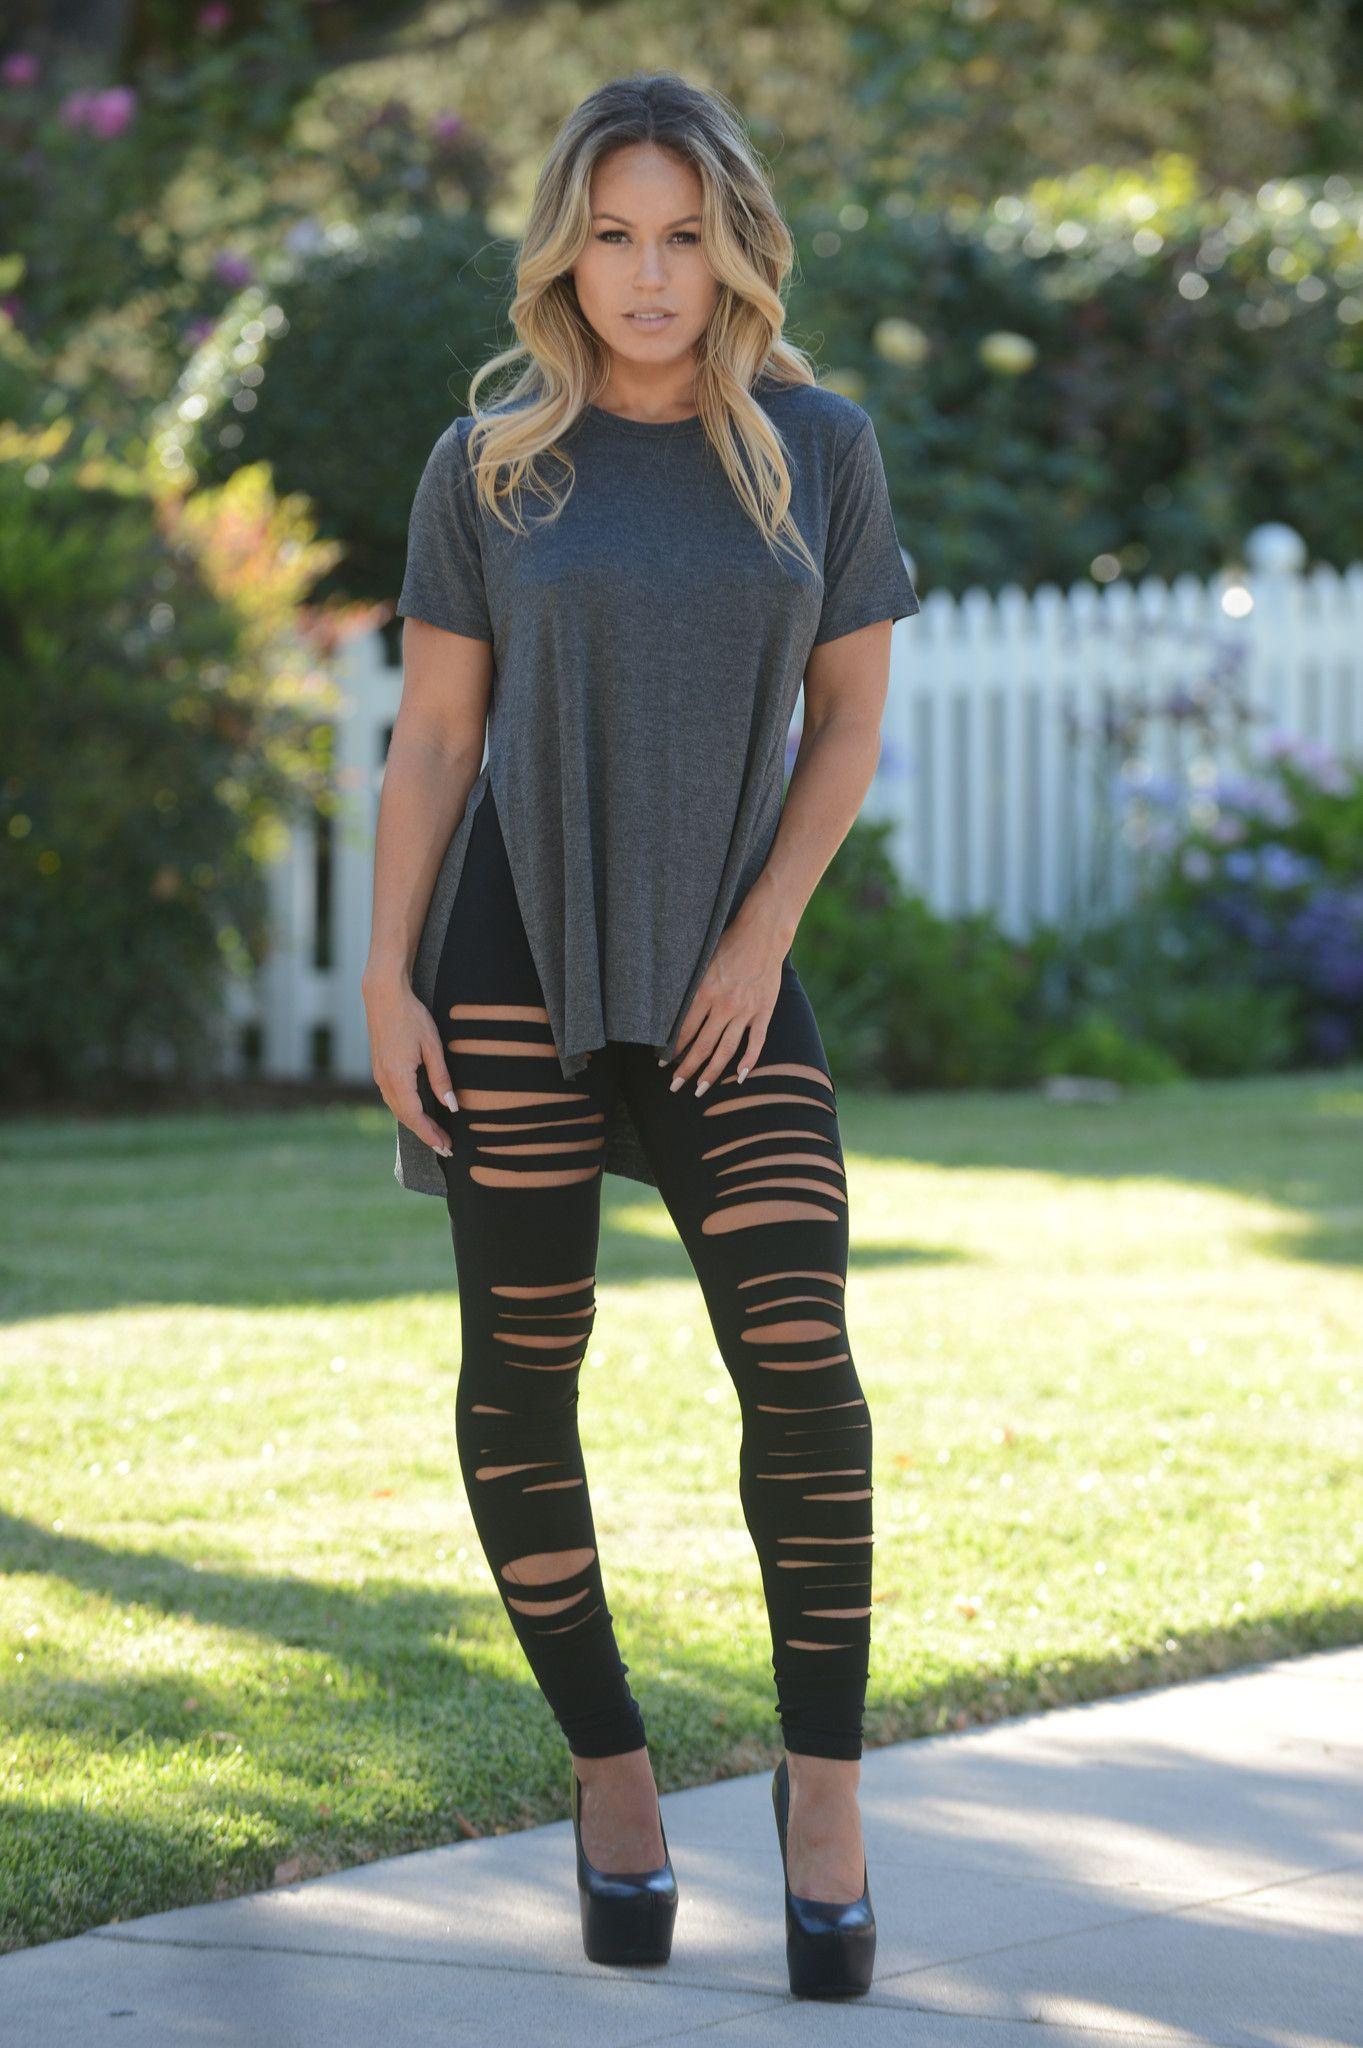 Black Ripped Leggings - Black | Ripped leggings Leggings ...